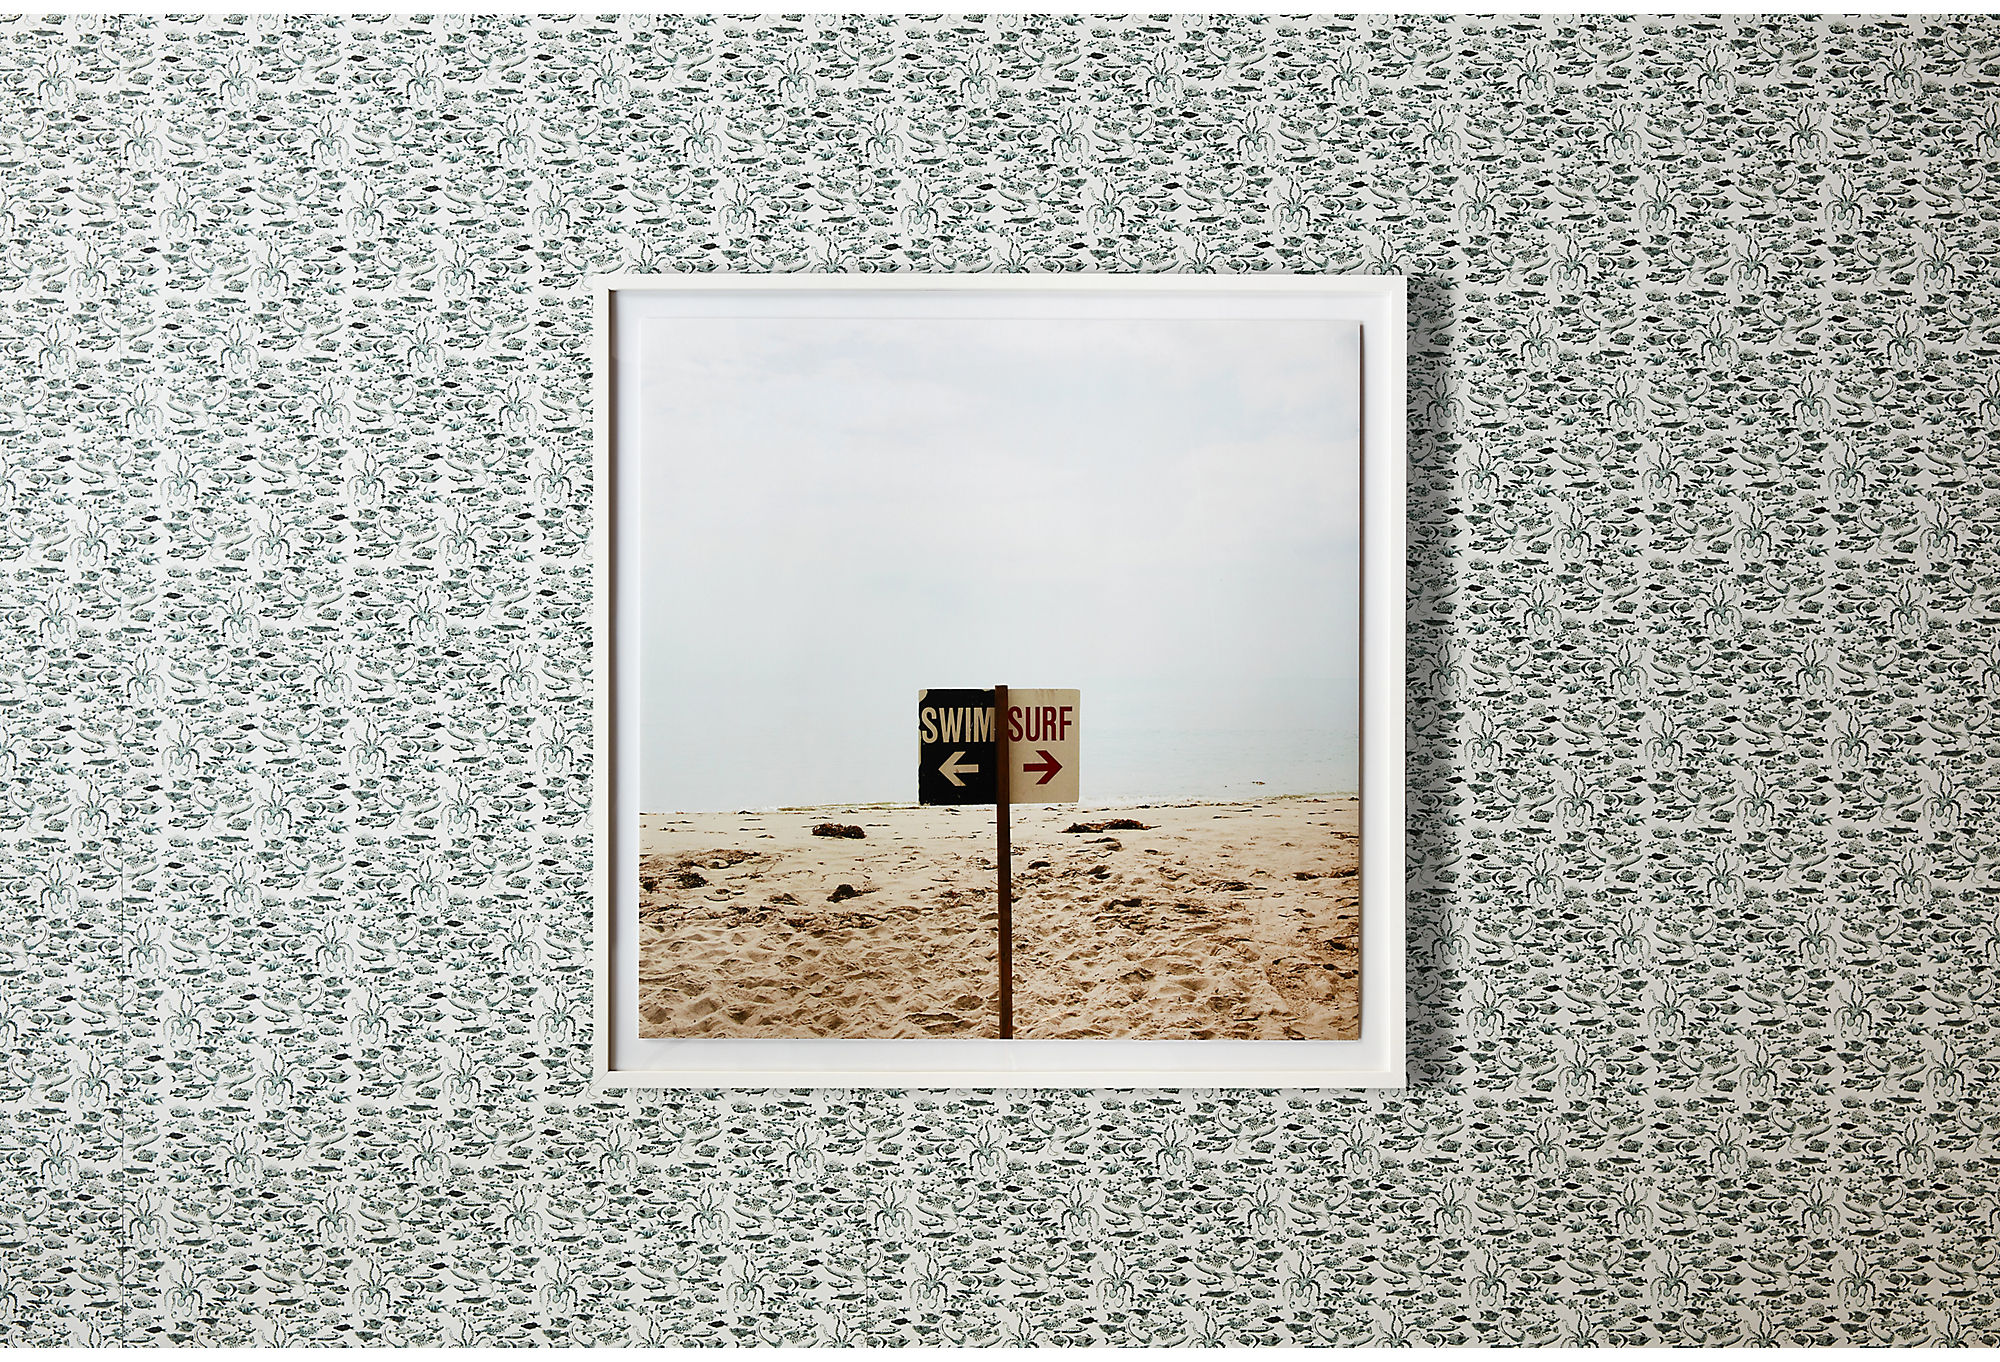 Fish Wallpaper by Vikki Chu; the framed photo is Swim/Surf by Christine Flynn.